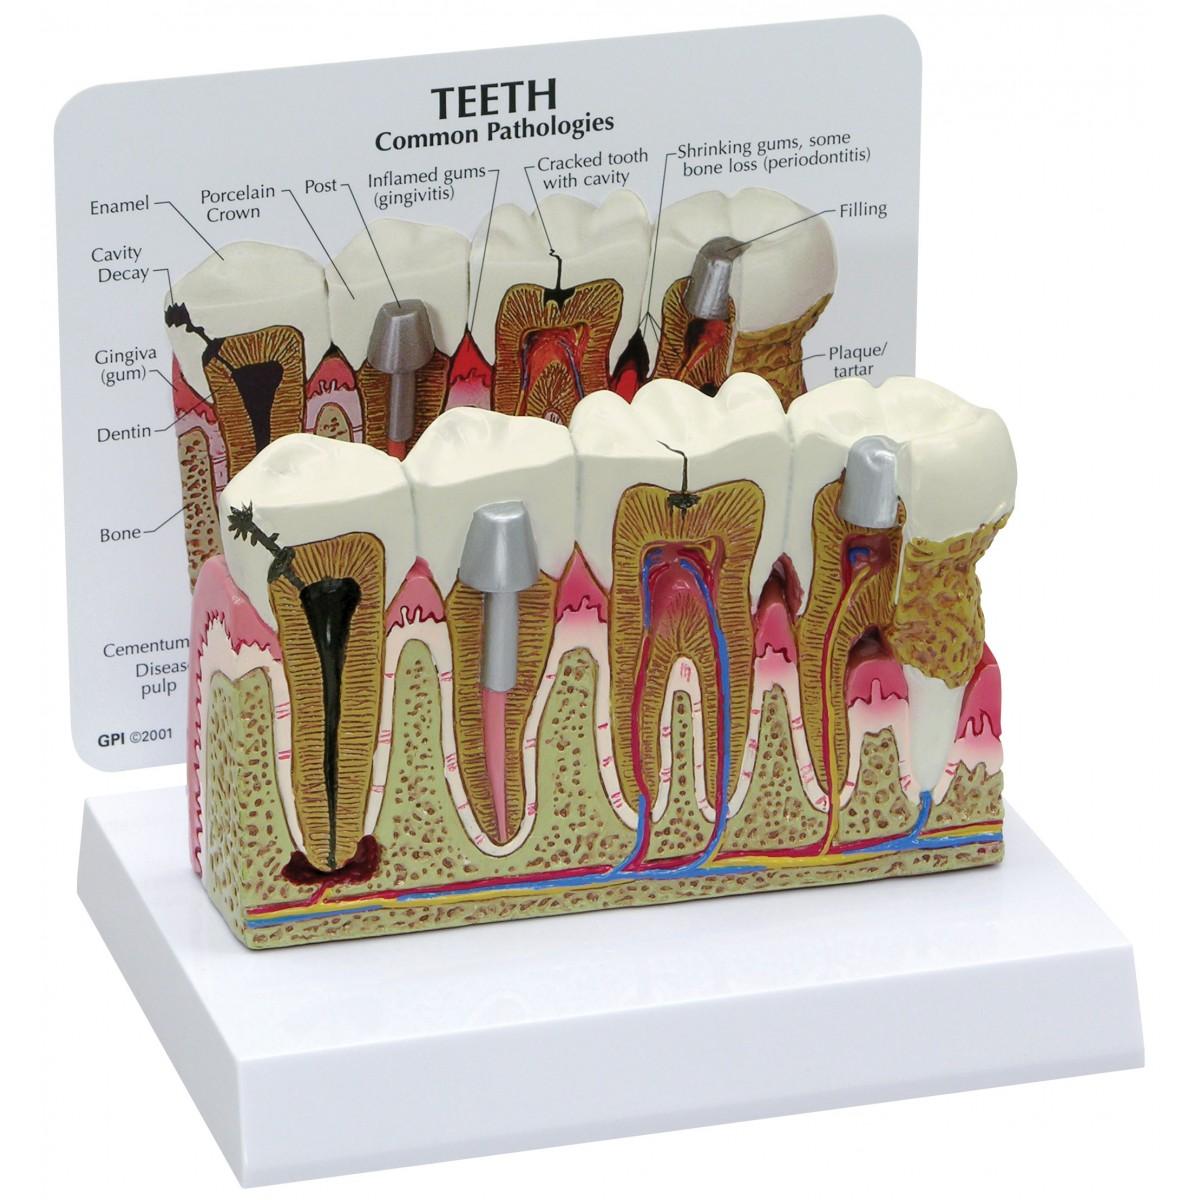 Teeth With Common Pathologies Dental Models Human Anatomy Biology